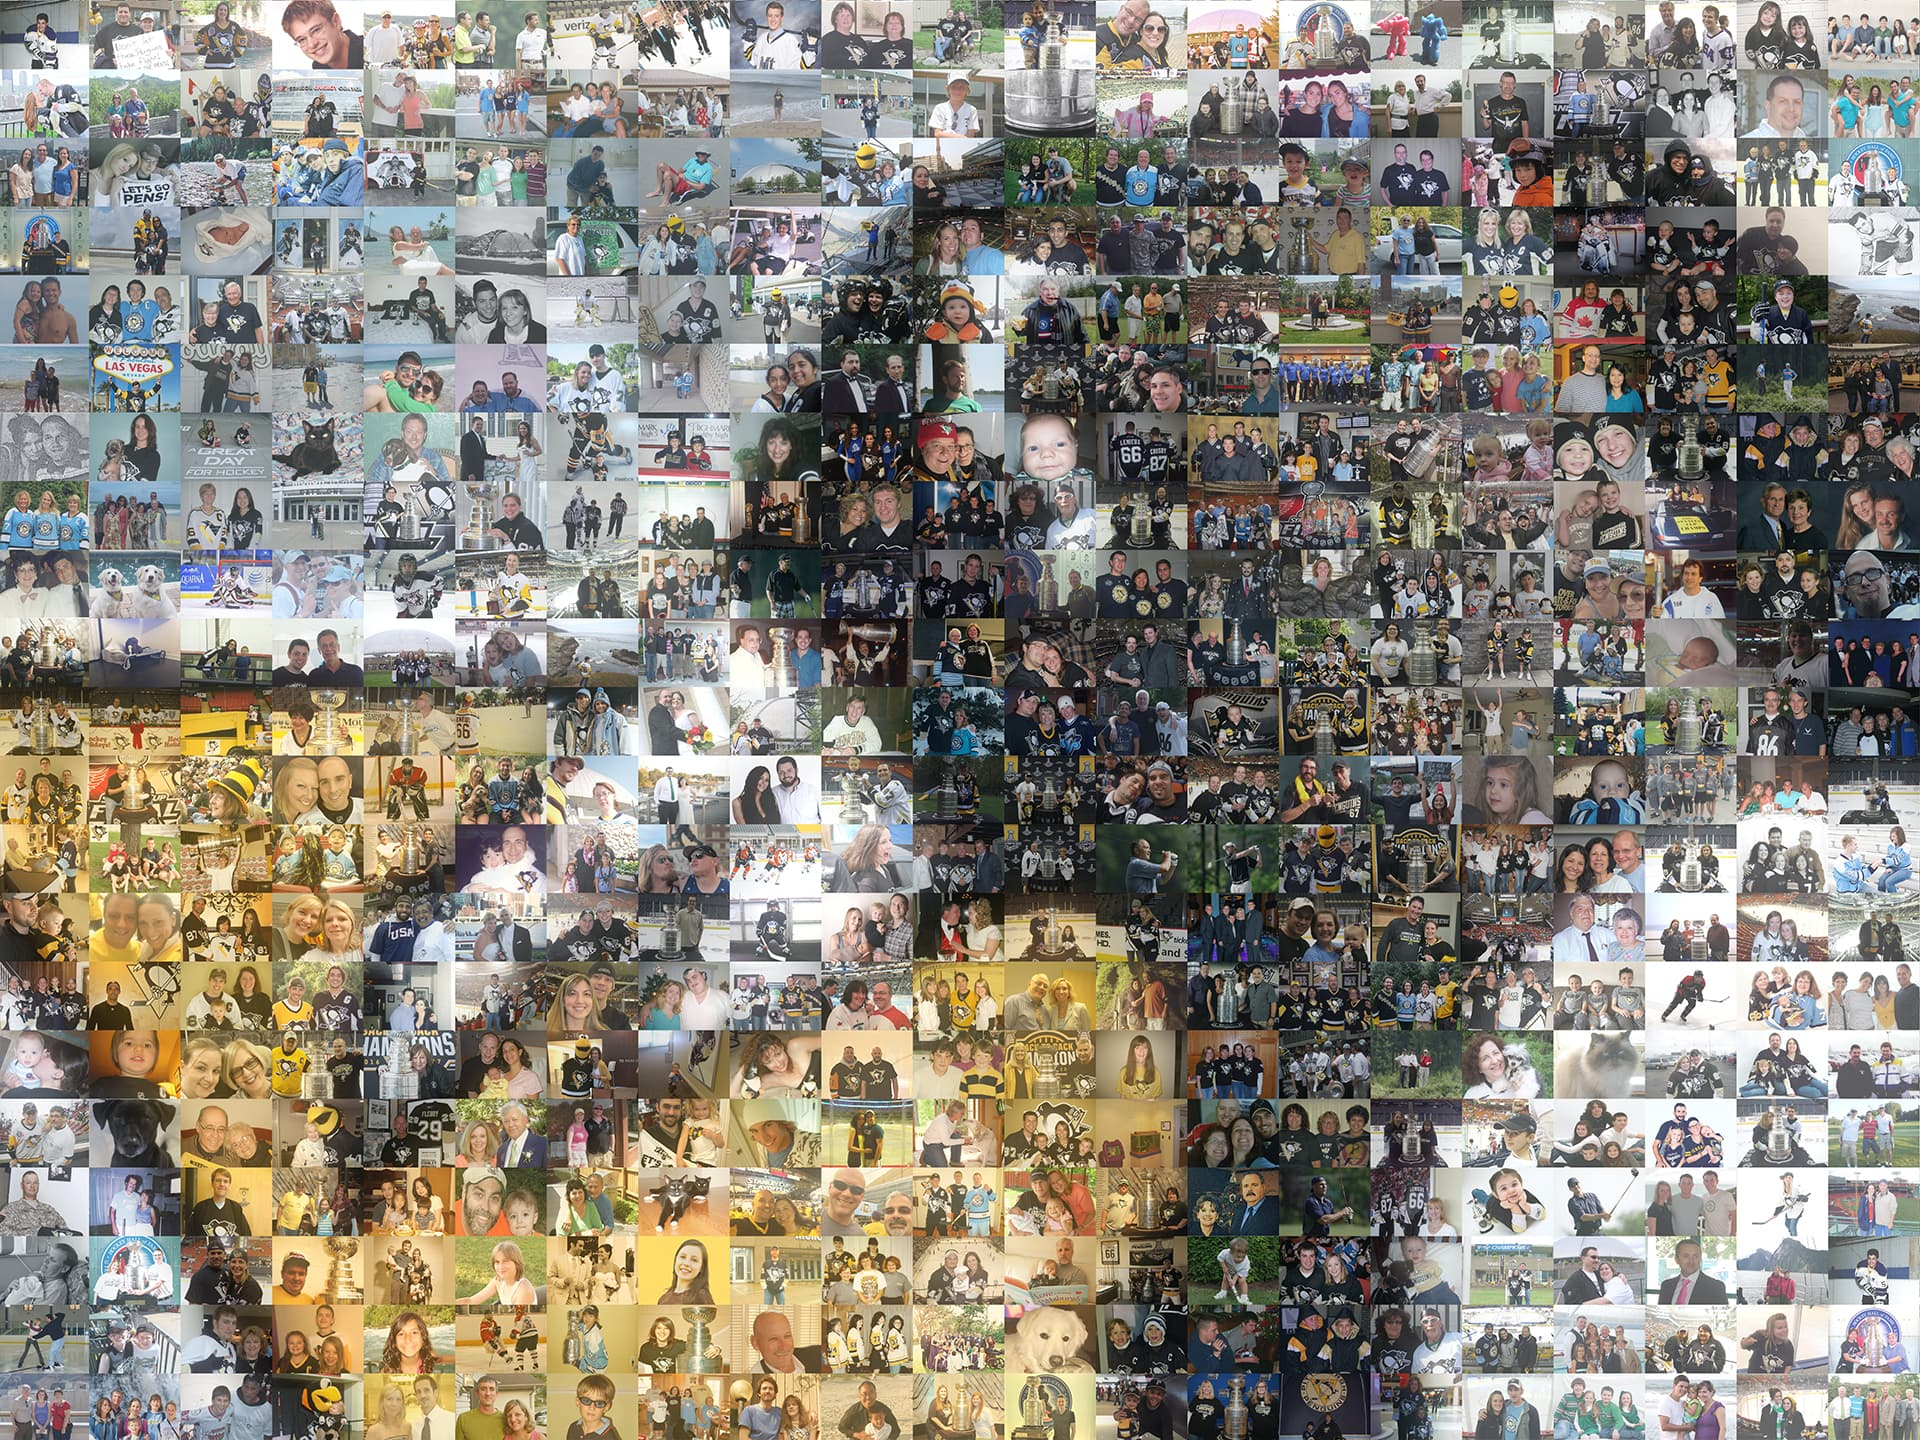 mario-photo-mosaic-2.0